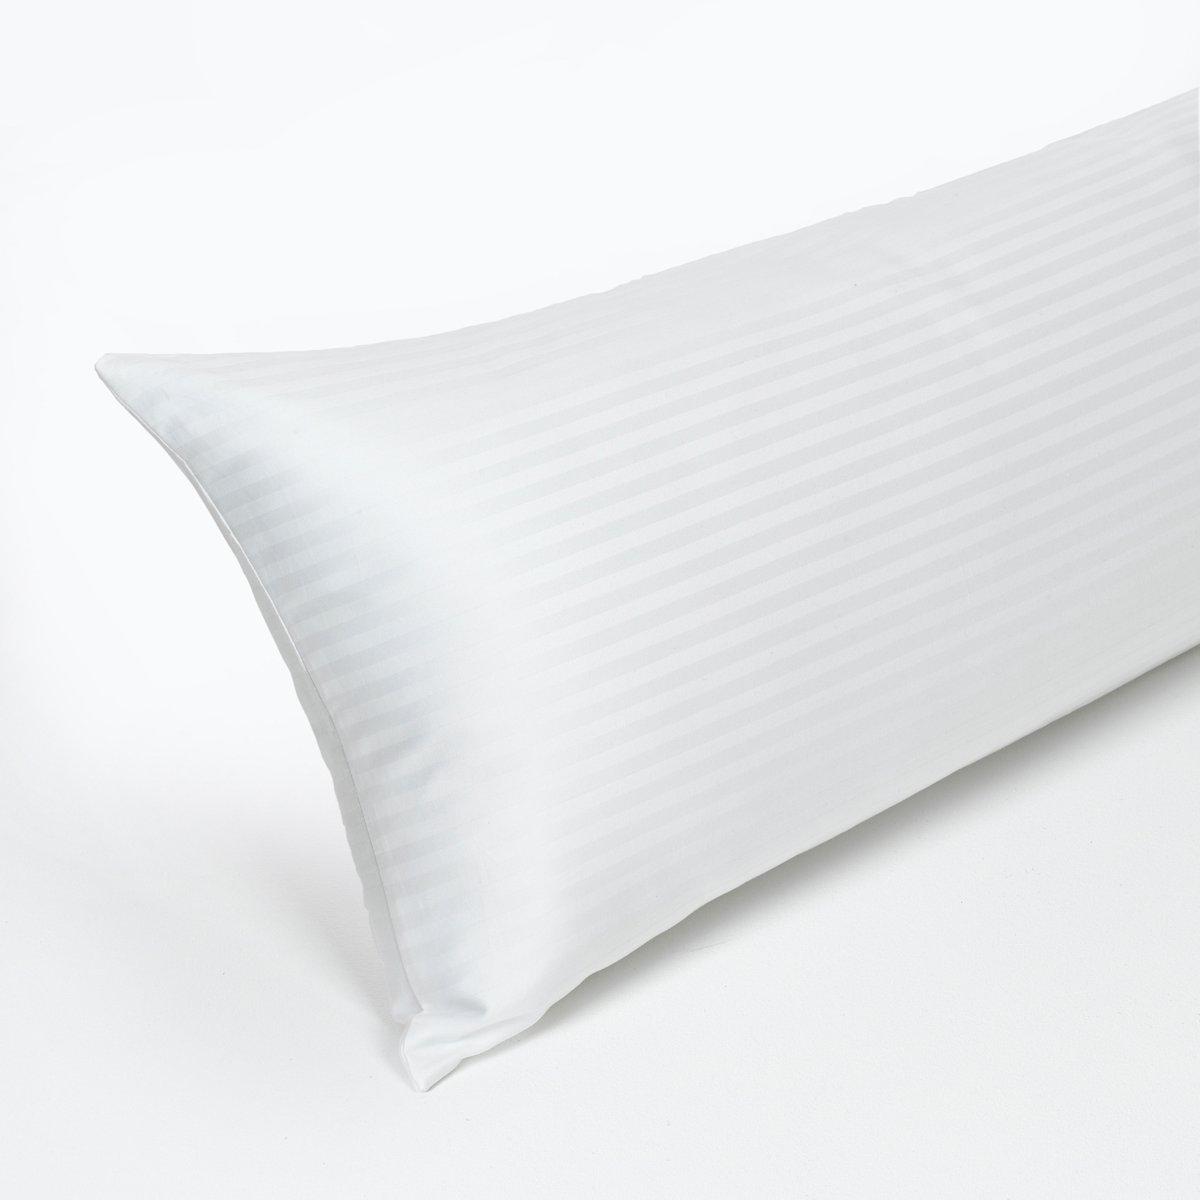 Подушка-валик плоская, Stan